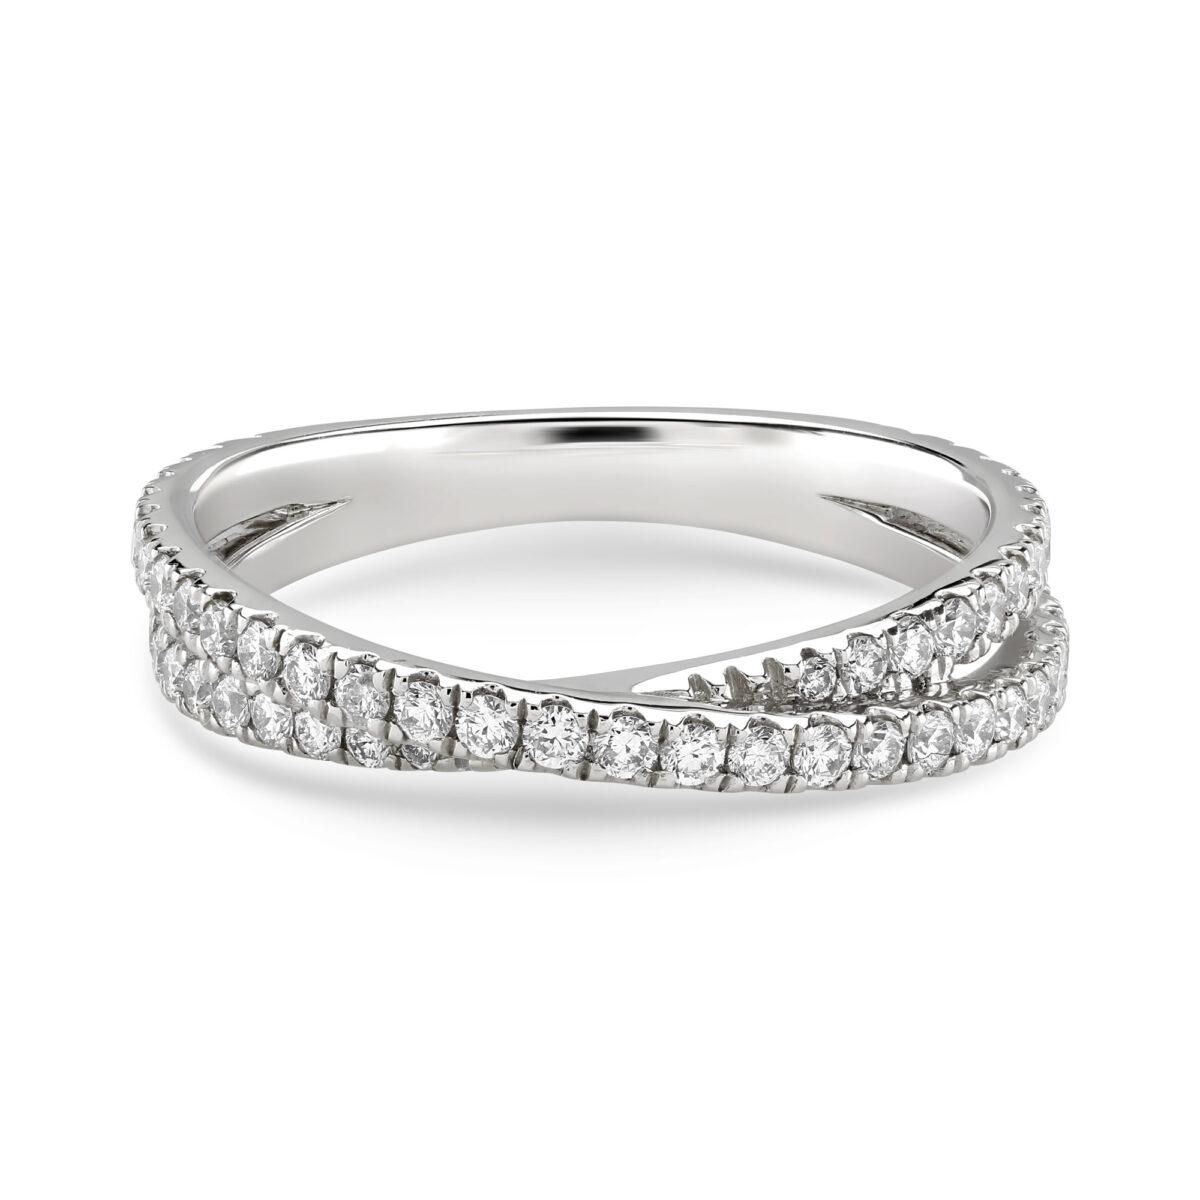 product/d/i/diamond_twist_eternity_ring_08_04_177_a_1.jpg;;product/d/i/diamond_twist_eternity_ring_08_04_177_b.jpg;;product/d/i/diamond_twist_eternity_ring_08_04_177_l_s_1.jpg;;product/d/m/dmr-packaging_206_1_1.jpg